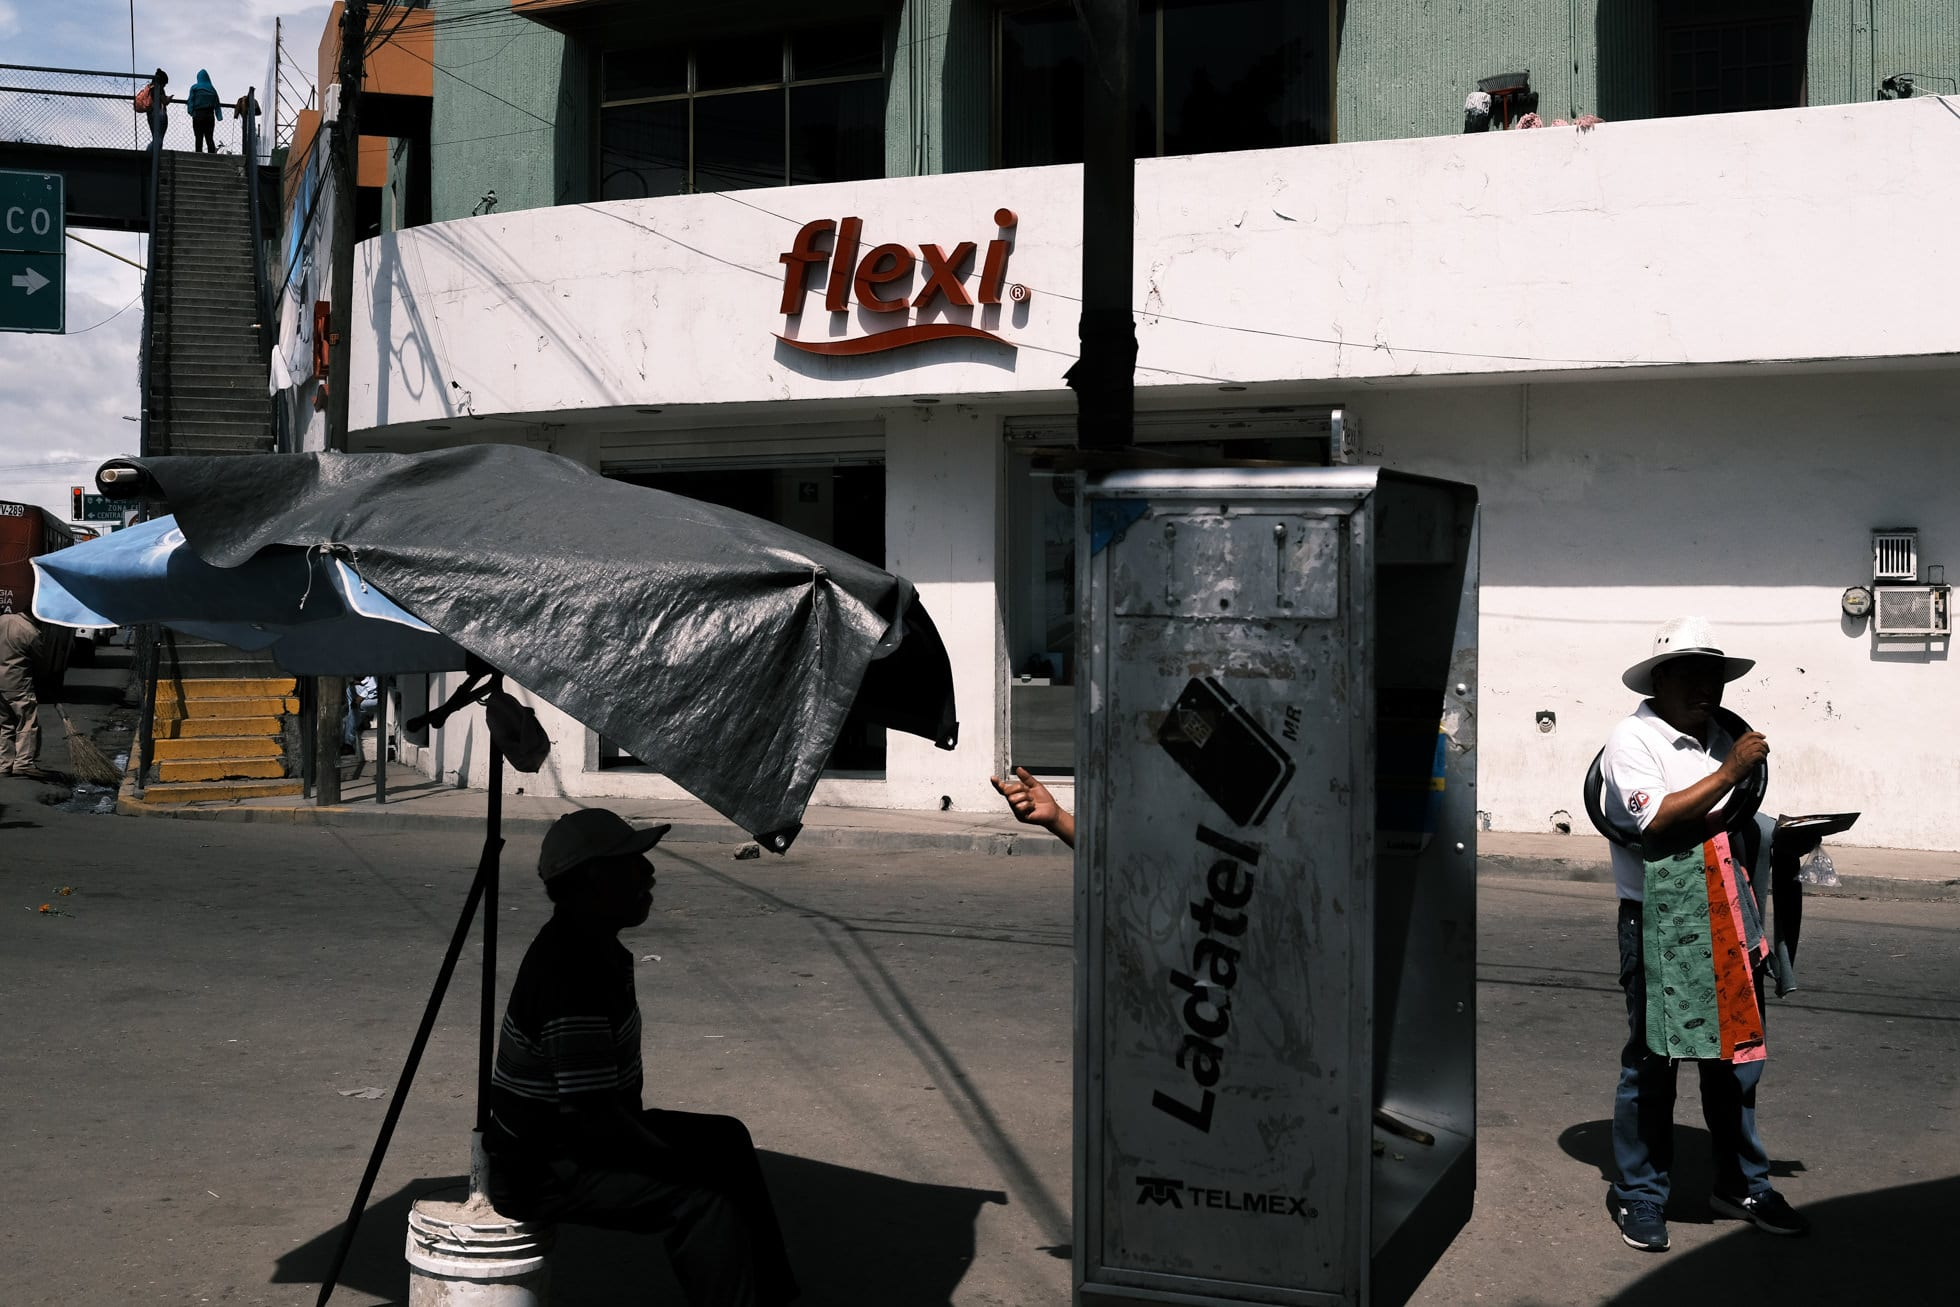 fujifilm-x-pro3-mexico-street-photography-33